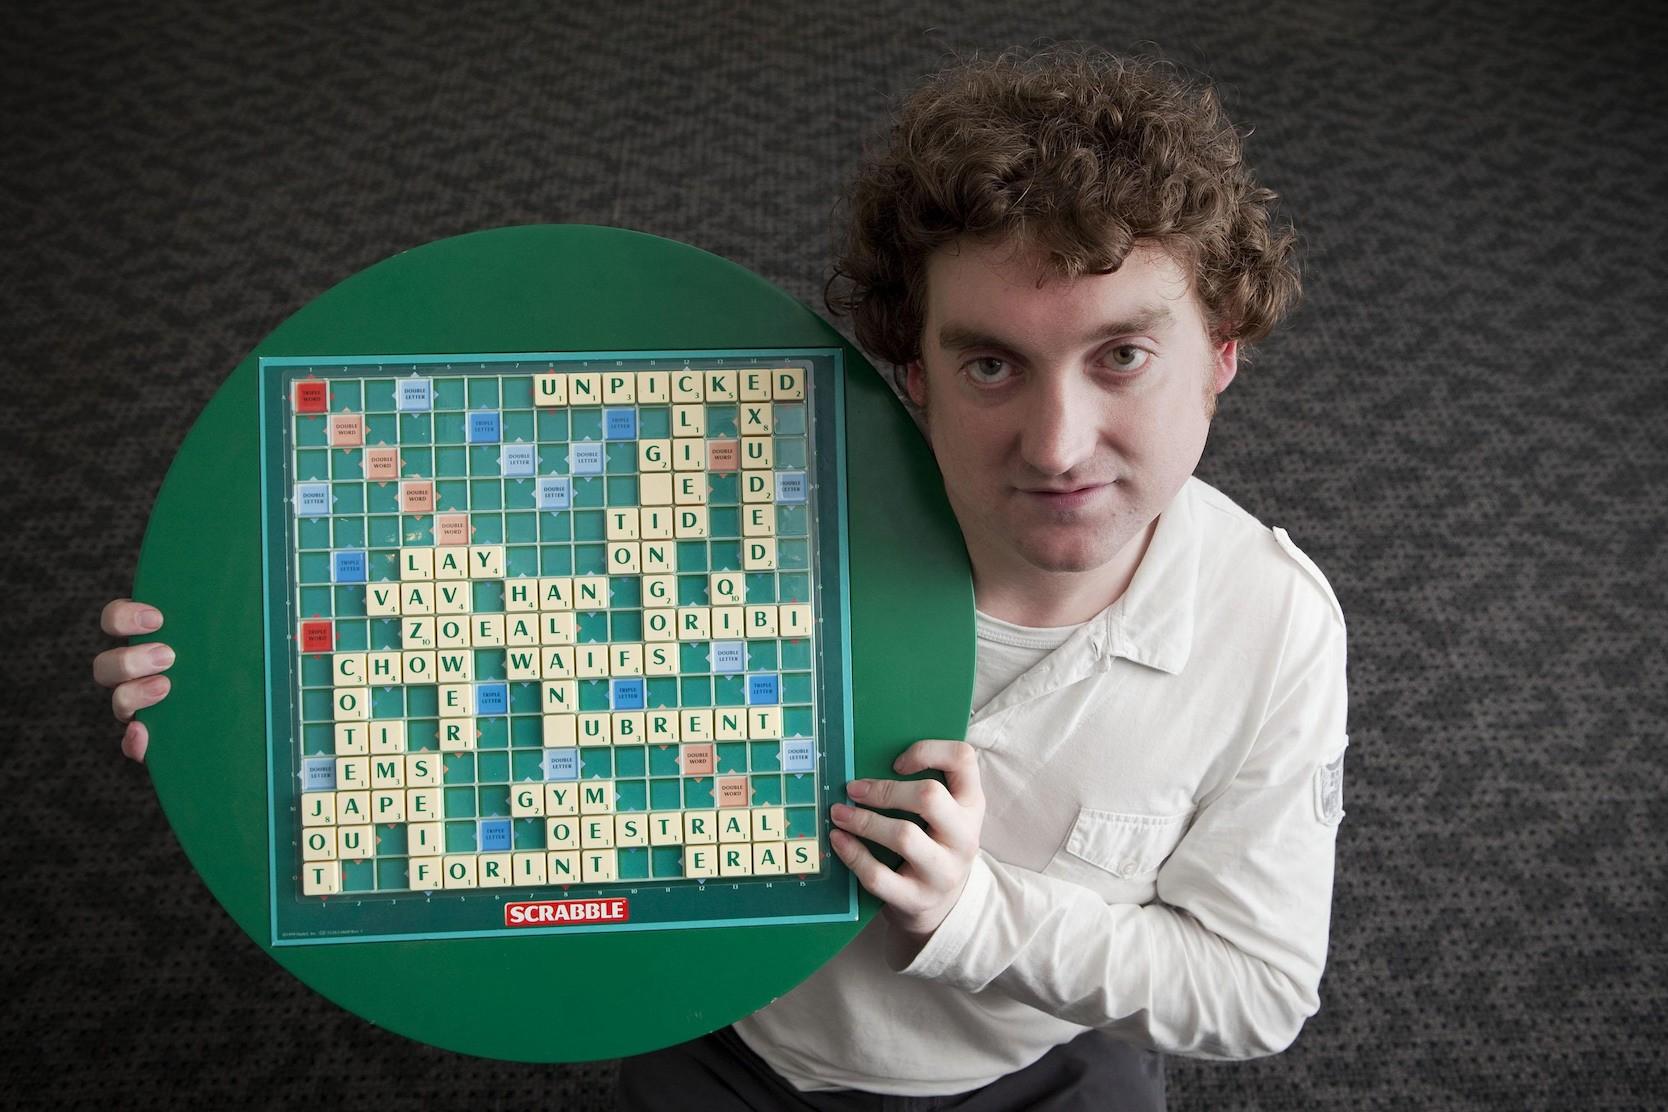 scrabble world champion Craig Beevers